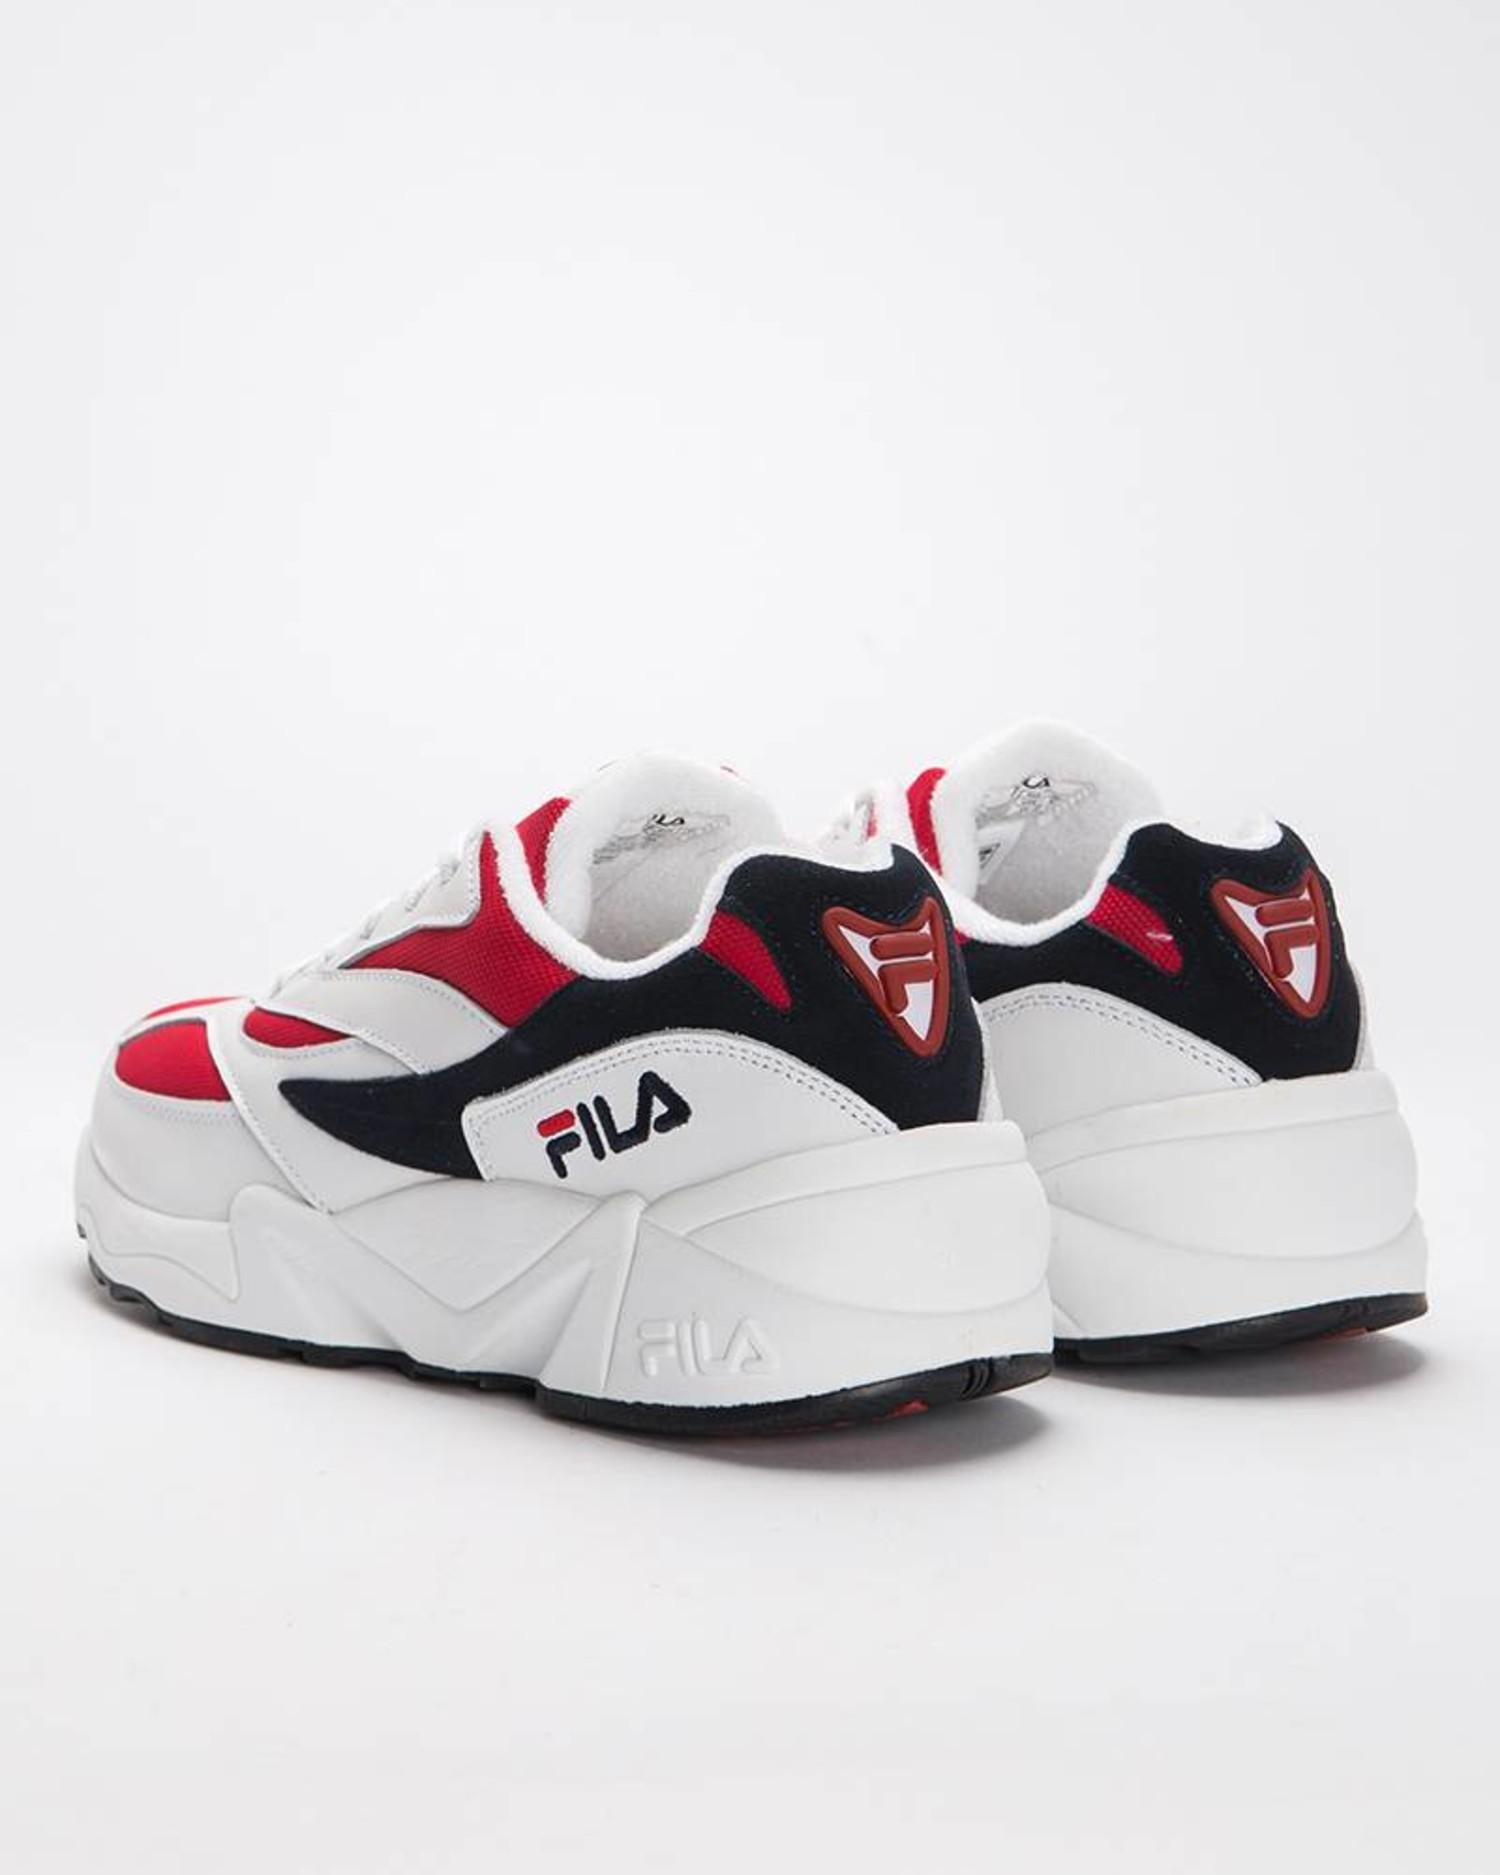 Fila v94 Low White/Fila Navy/Fila Red